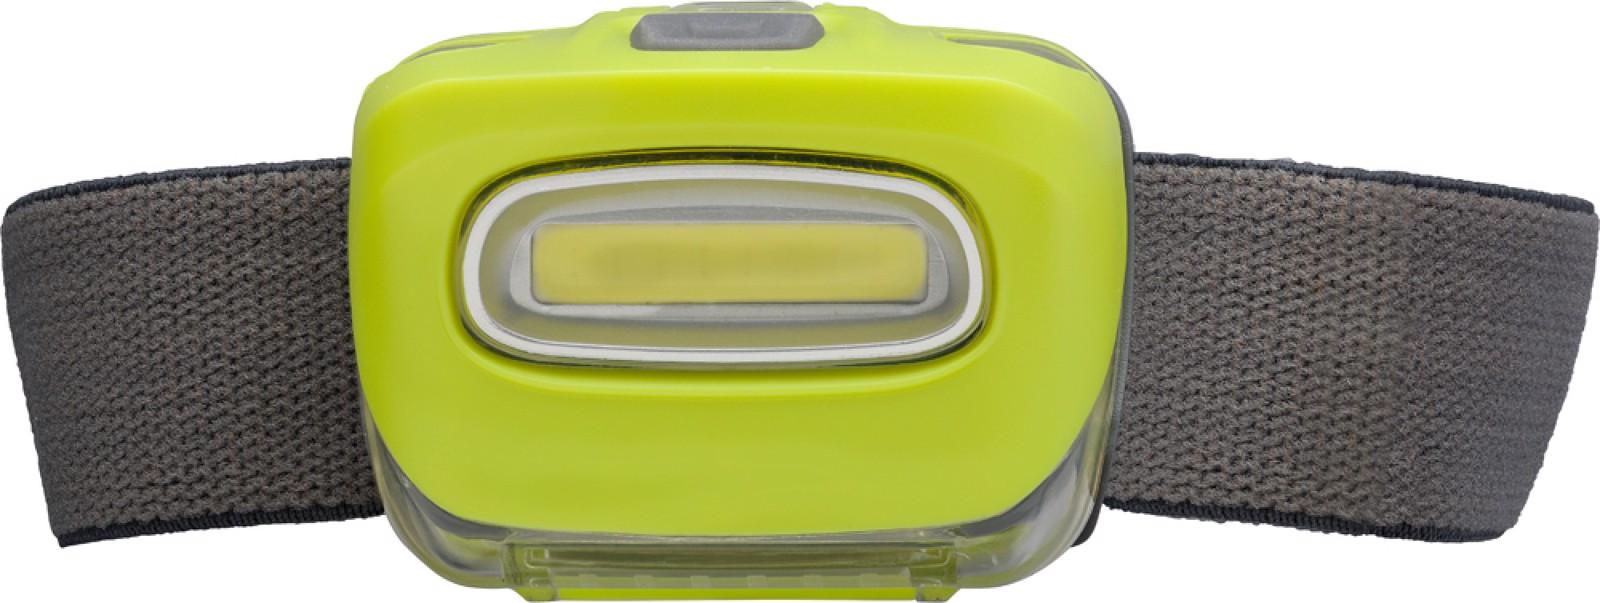 ABS head light - Lime